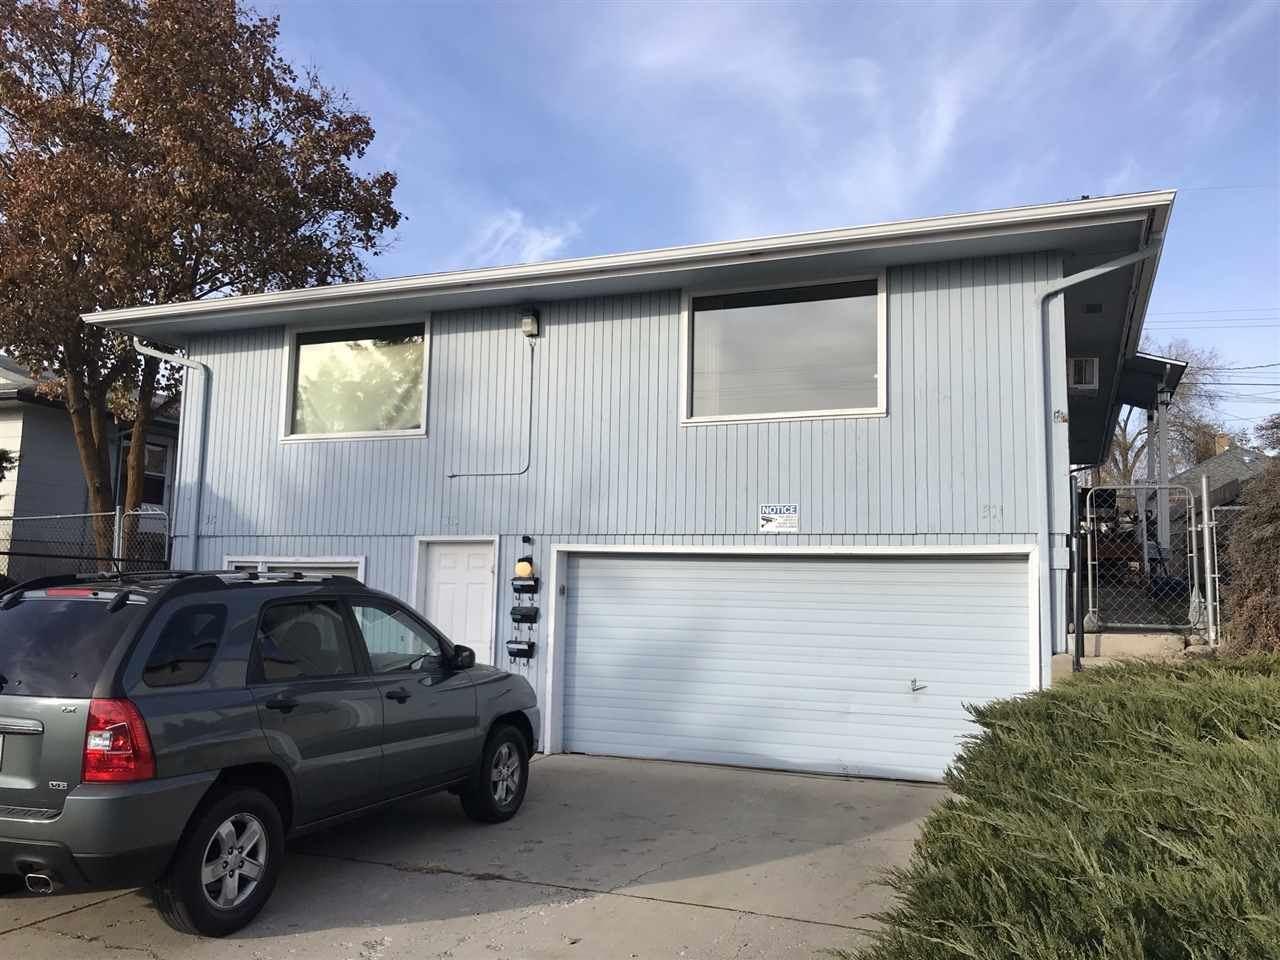 311 E Fairview Ave, Spokane, WA 99207 - #: 202024701